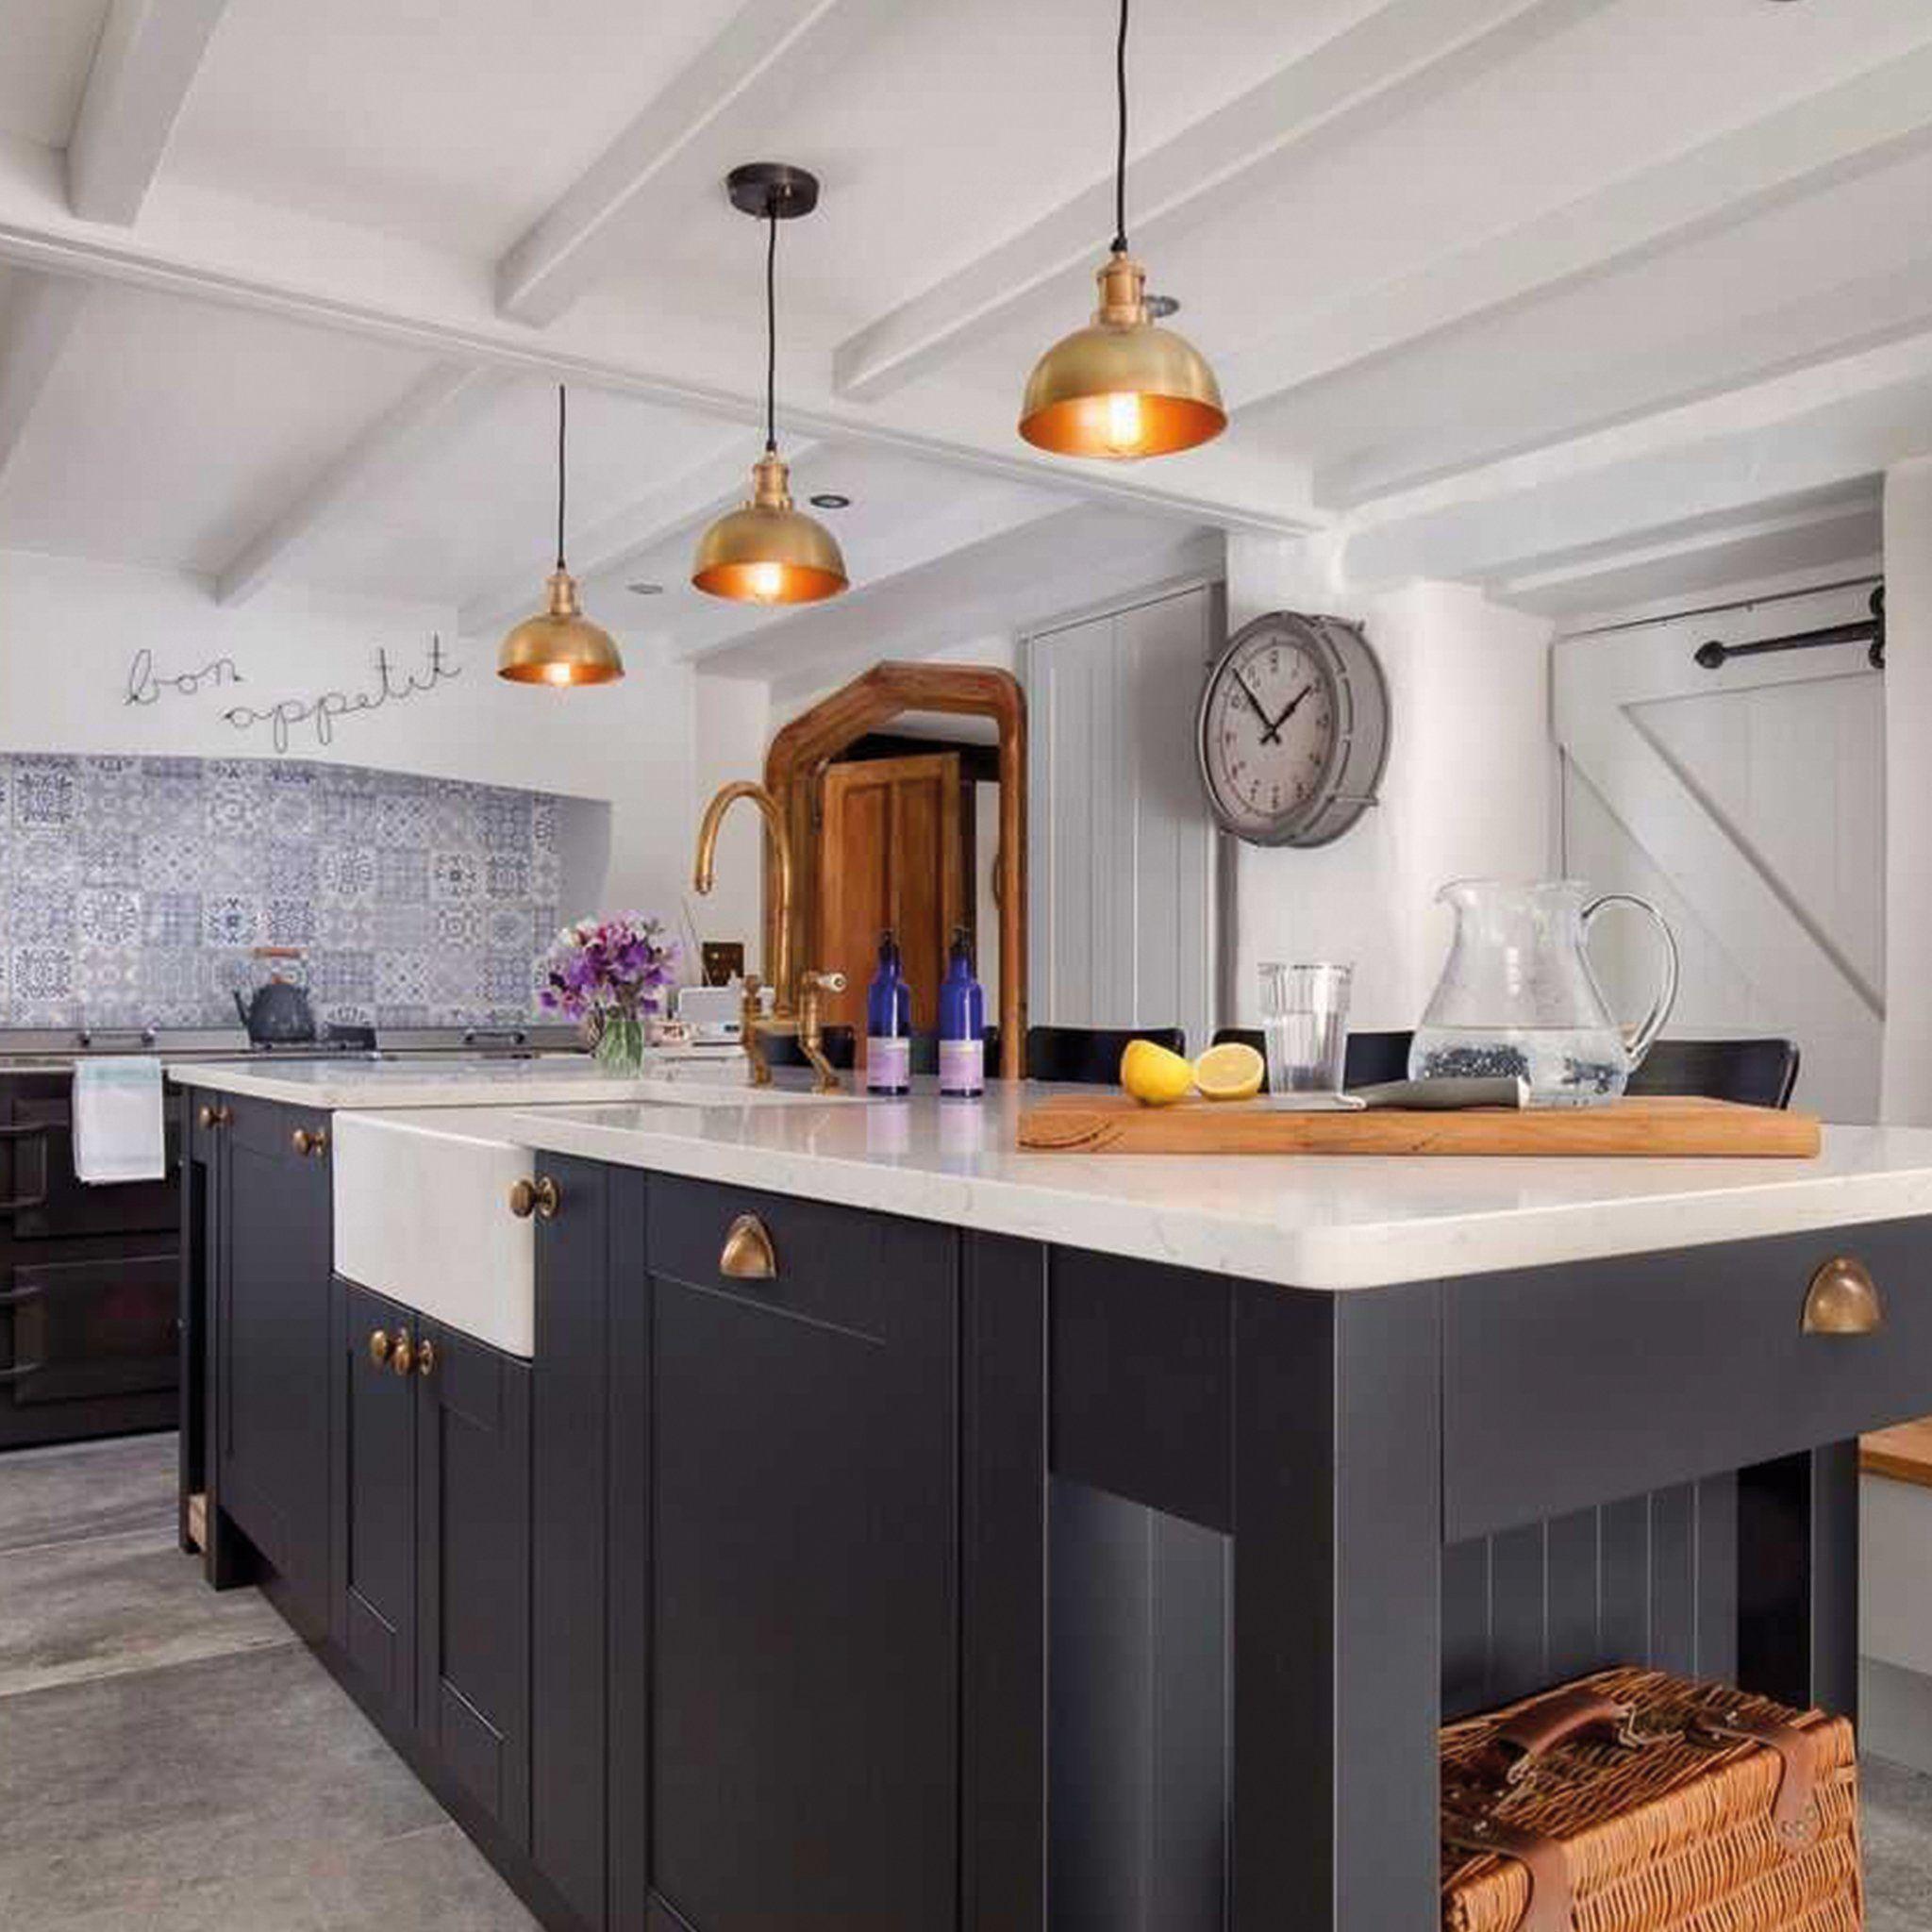 Kitchen Interior Design Lighting Trends In 2019